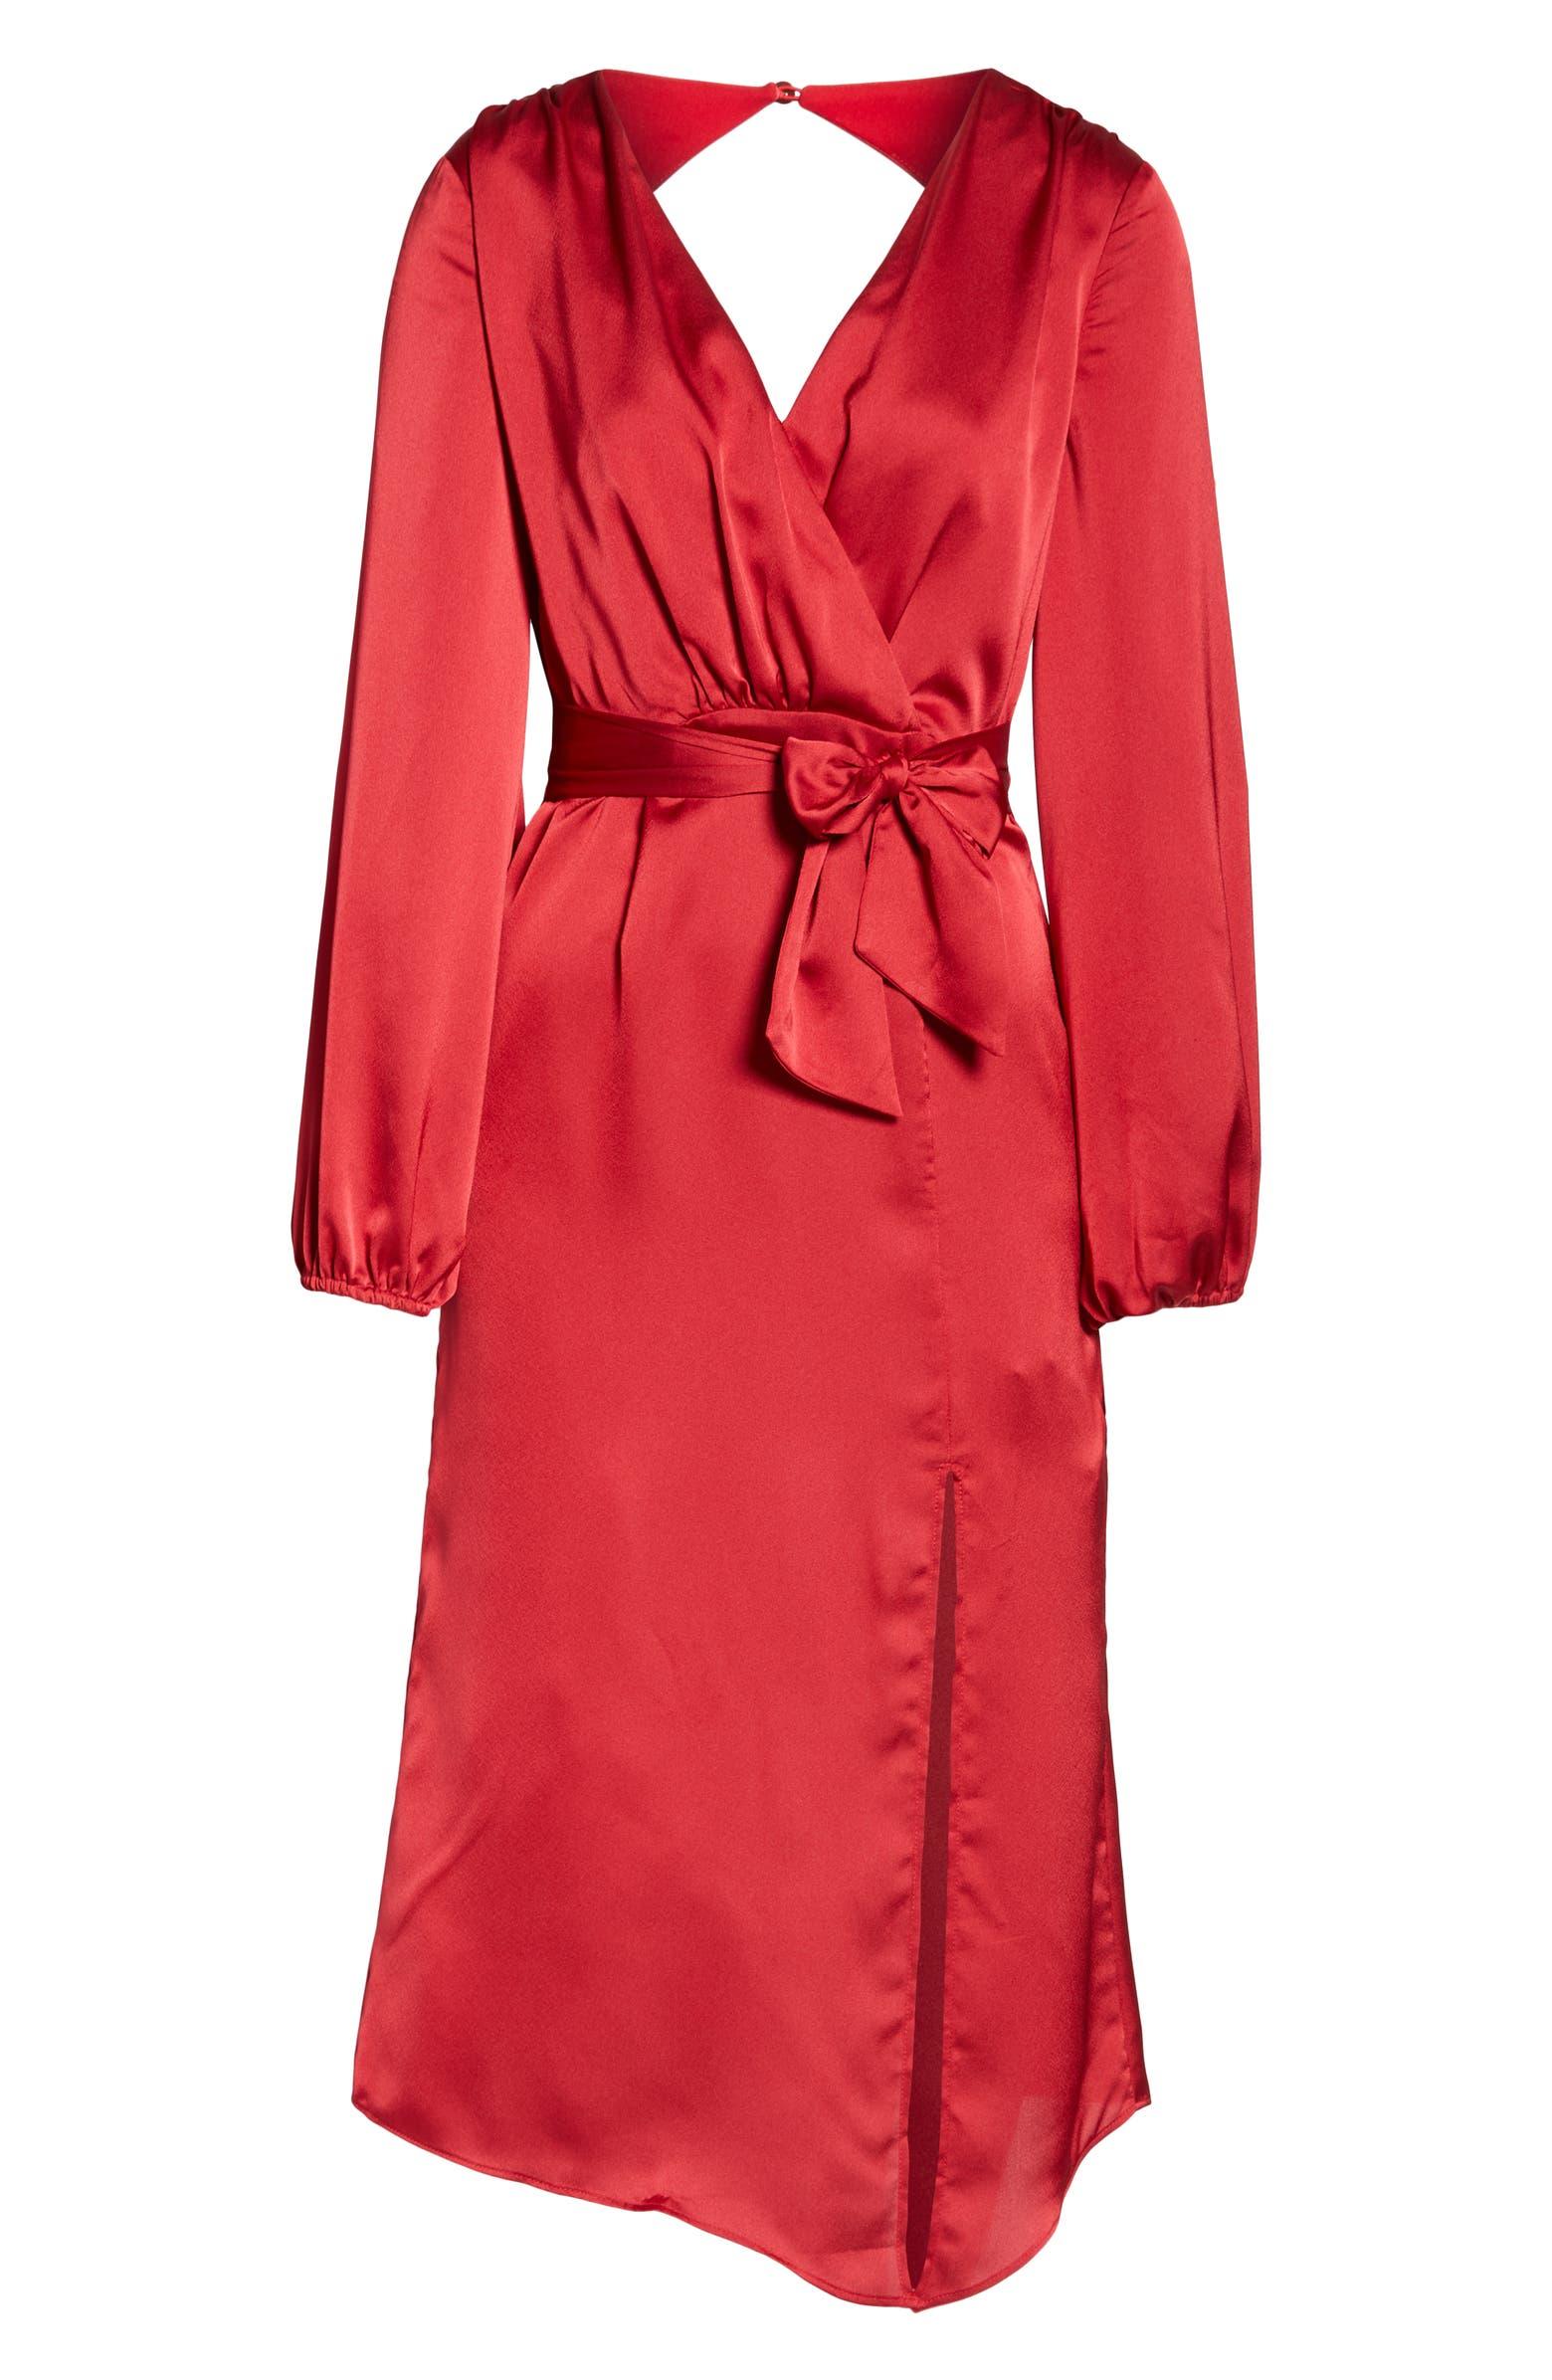 Emilia Long Sleeve Satin Dress FINDERS KEEPERS